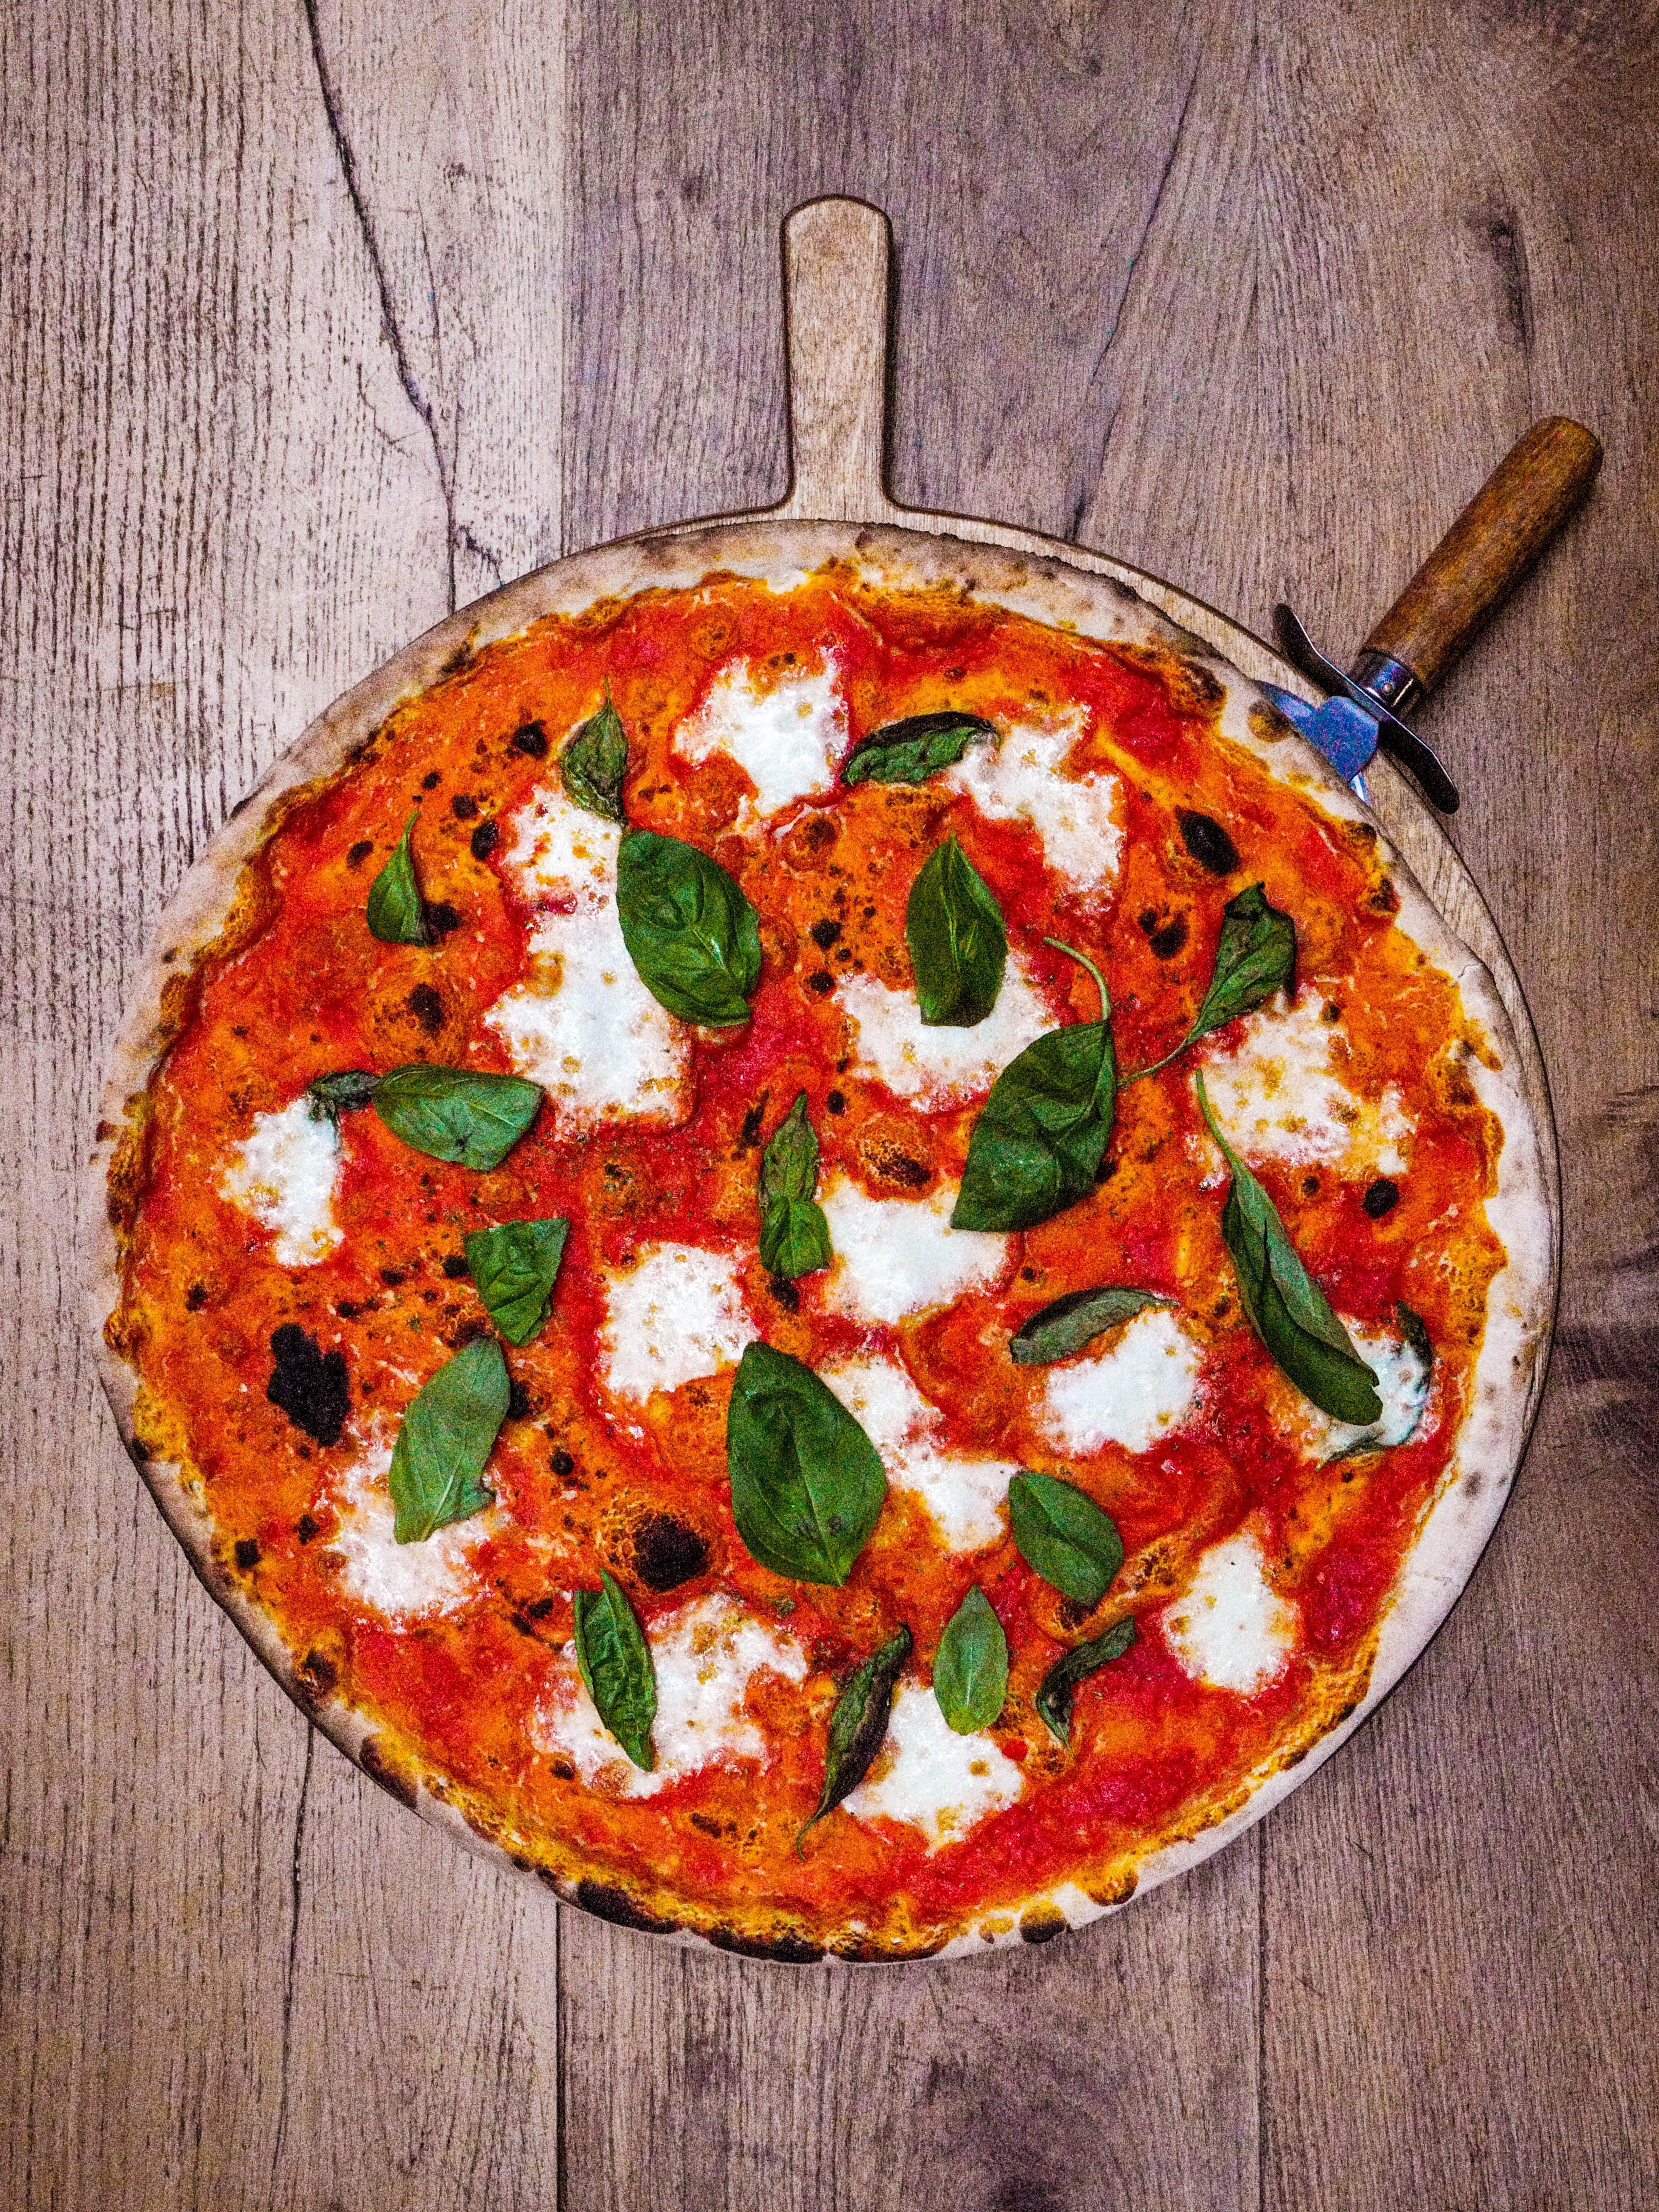 City Pantry - Homeslice Pizza - Margherita Pizza